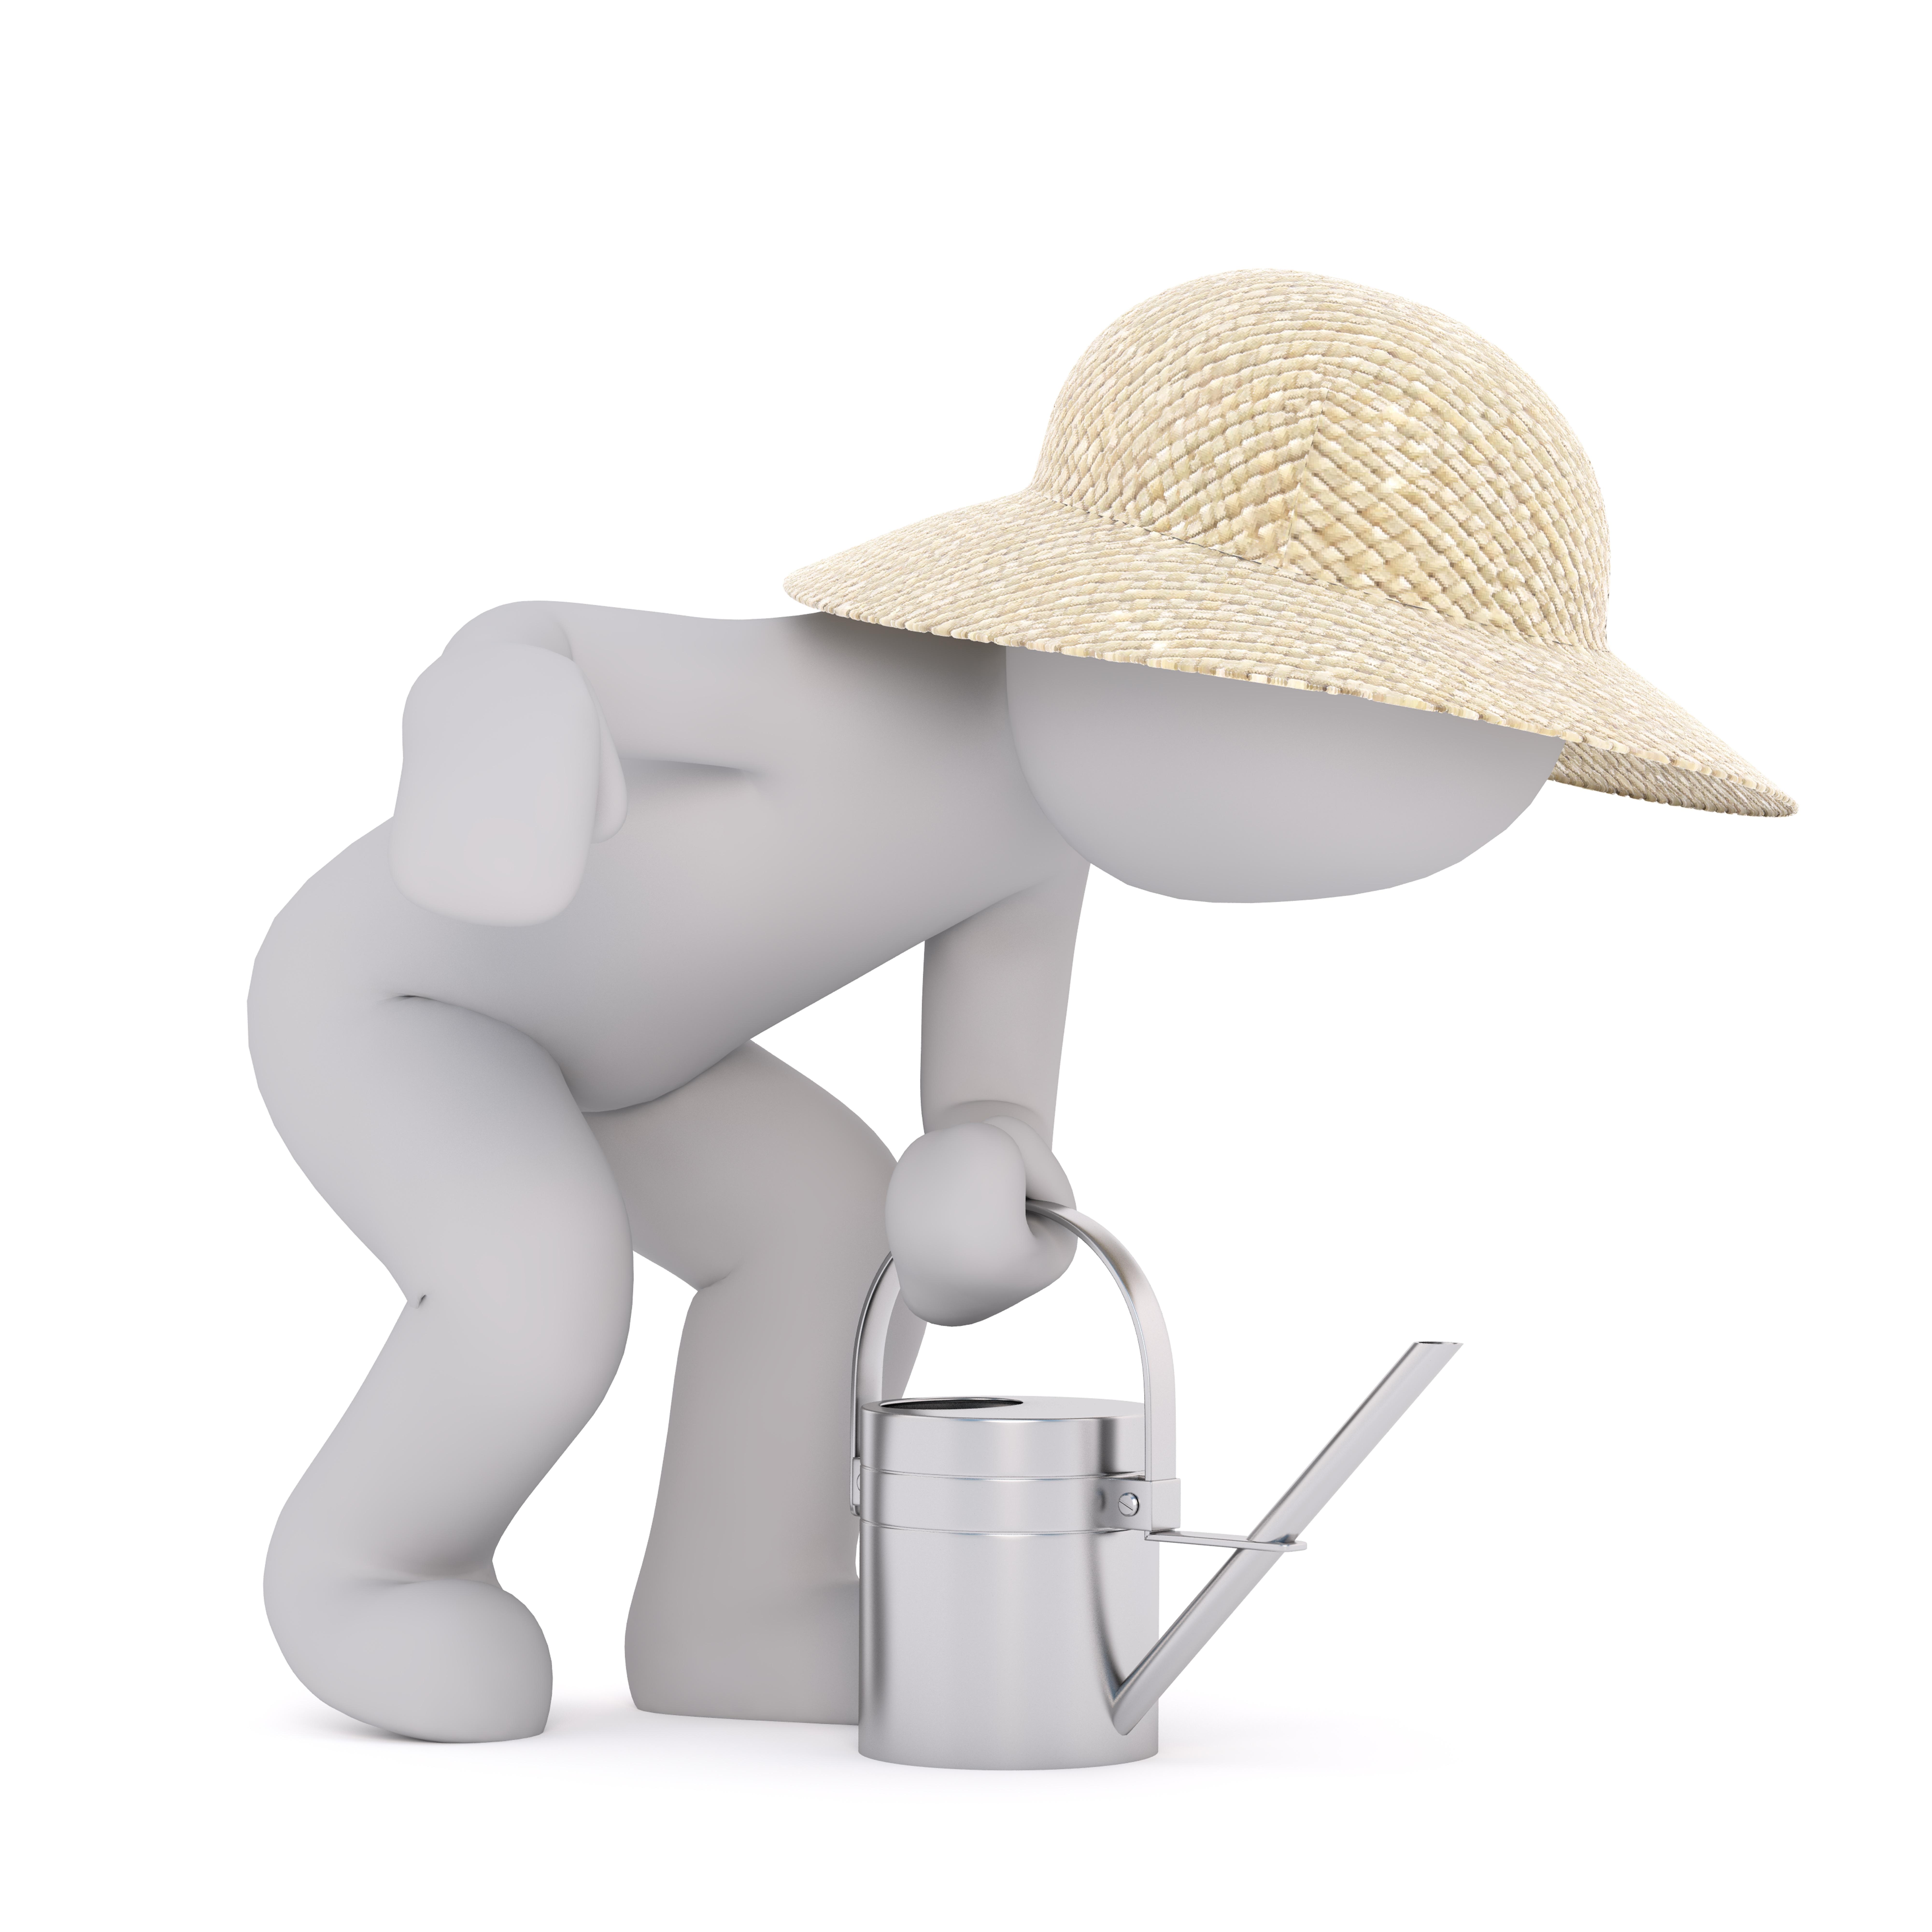 Fotos gratis : aislado, sombrero, ropa, Flores, producto, gorra ...